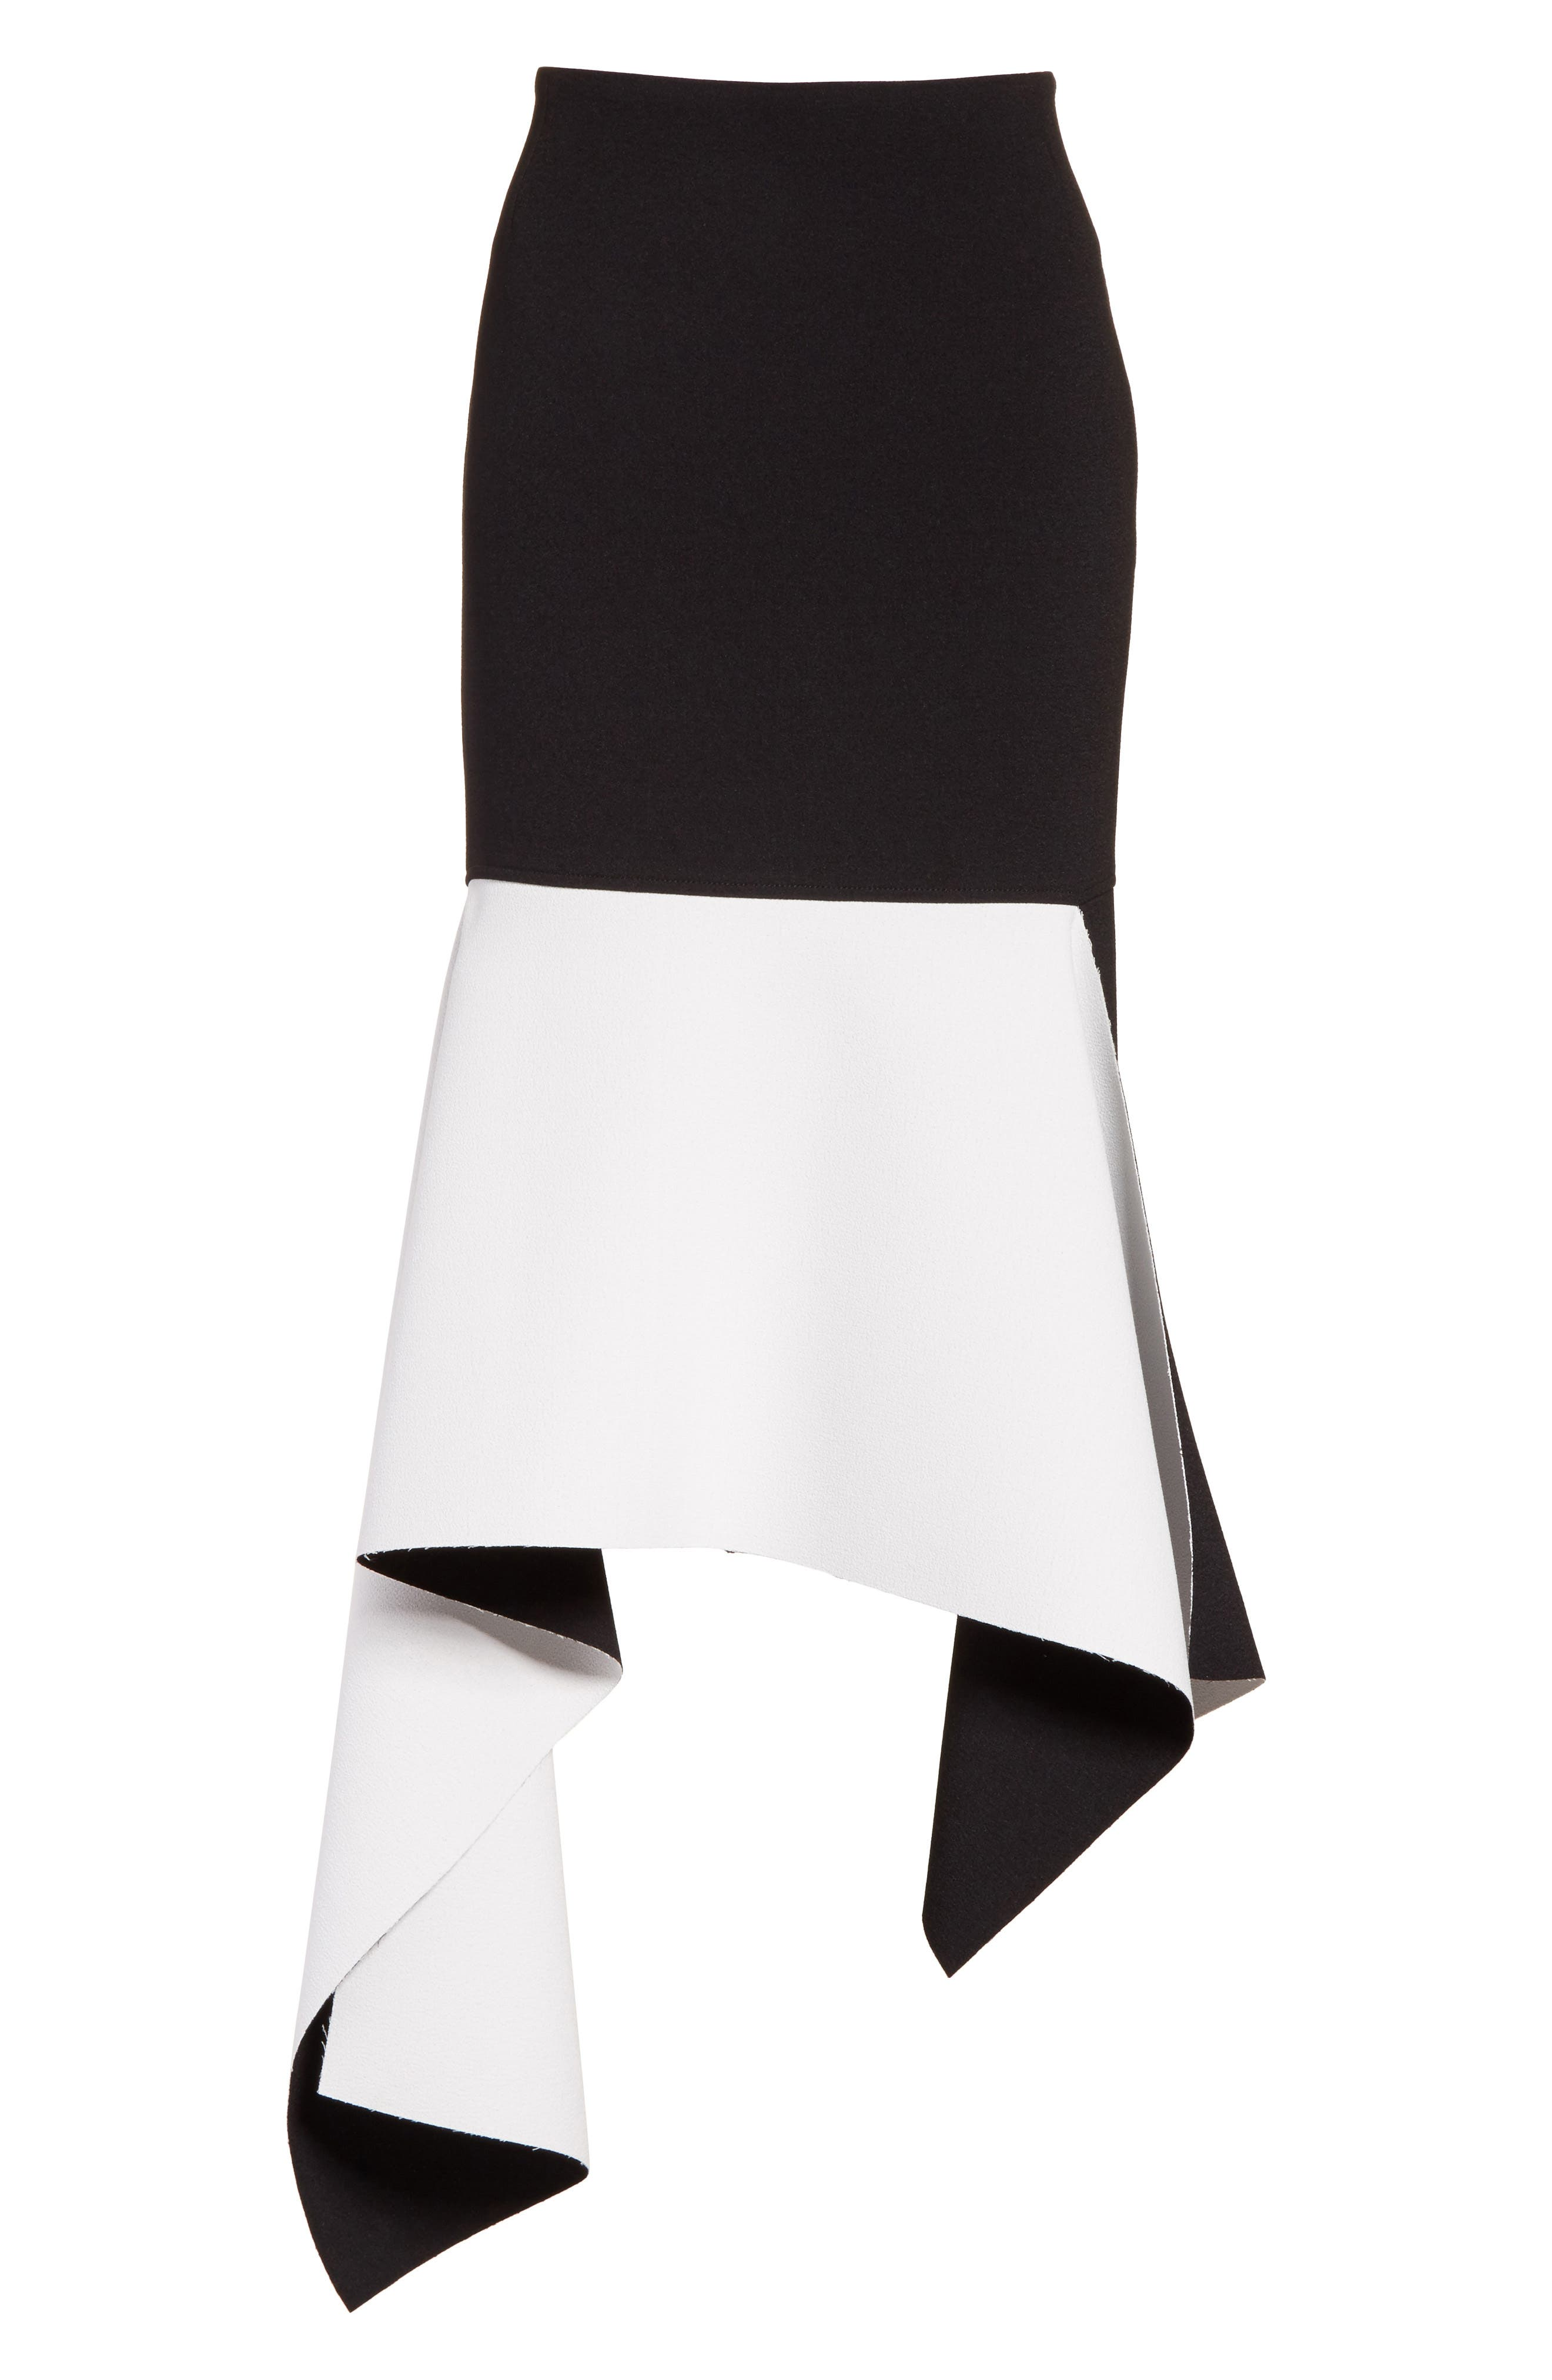 Marques'Almeida Asymmetrical Bicolor Crepe Skirt,                             Alternate thumbnail 6, color,                             003